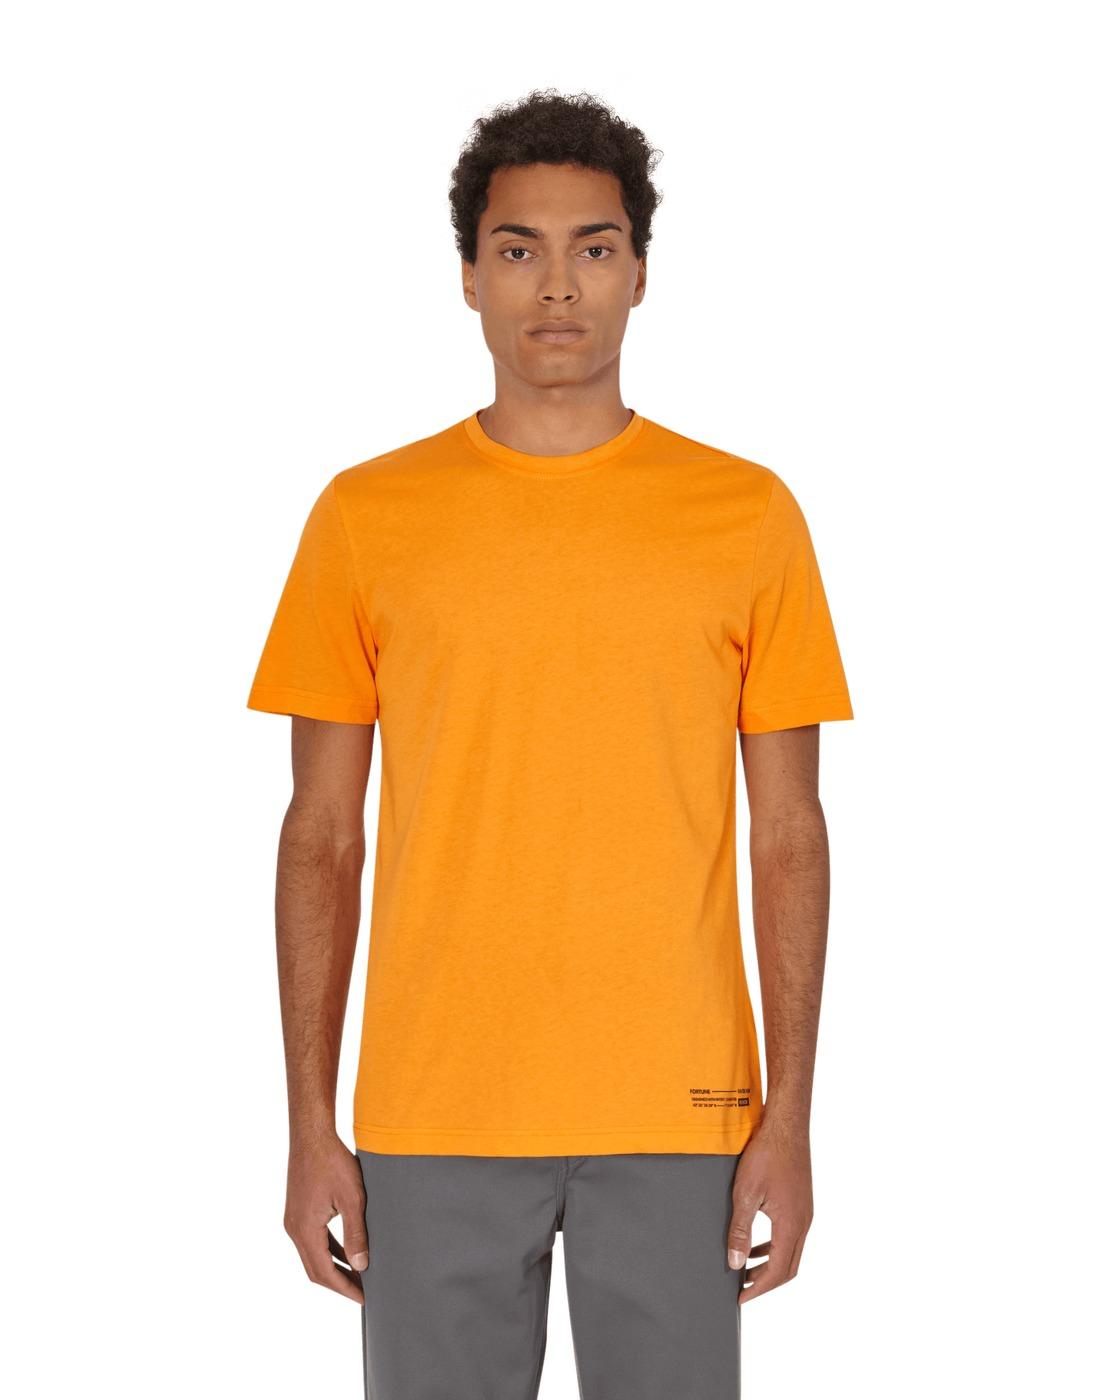 Photo: Reebok Edgeworks Graphic T Shirt Multi